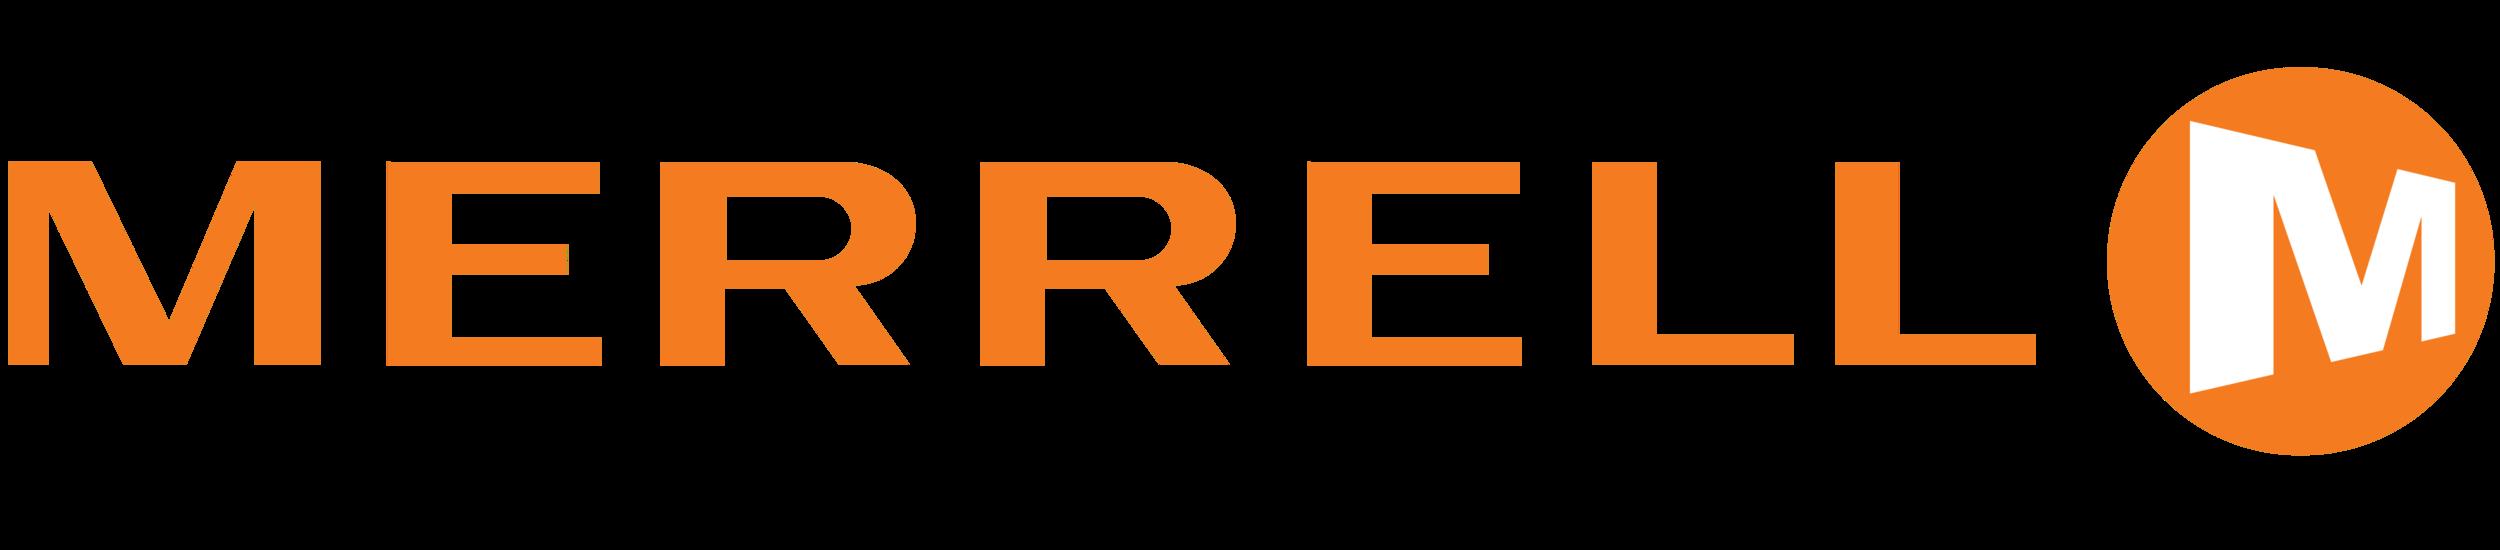 Merrell_logo_logotype_emblem.png